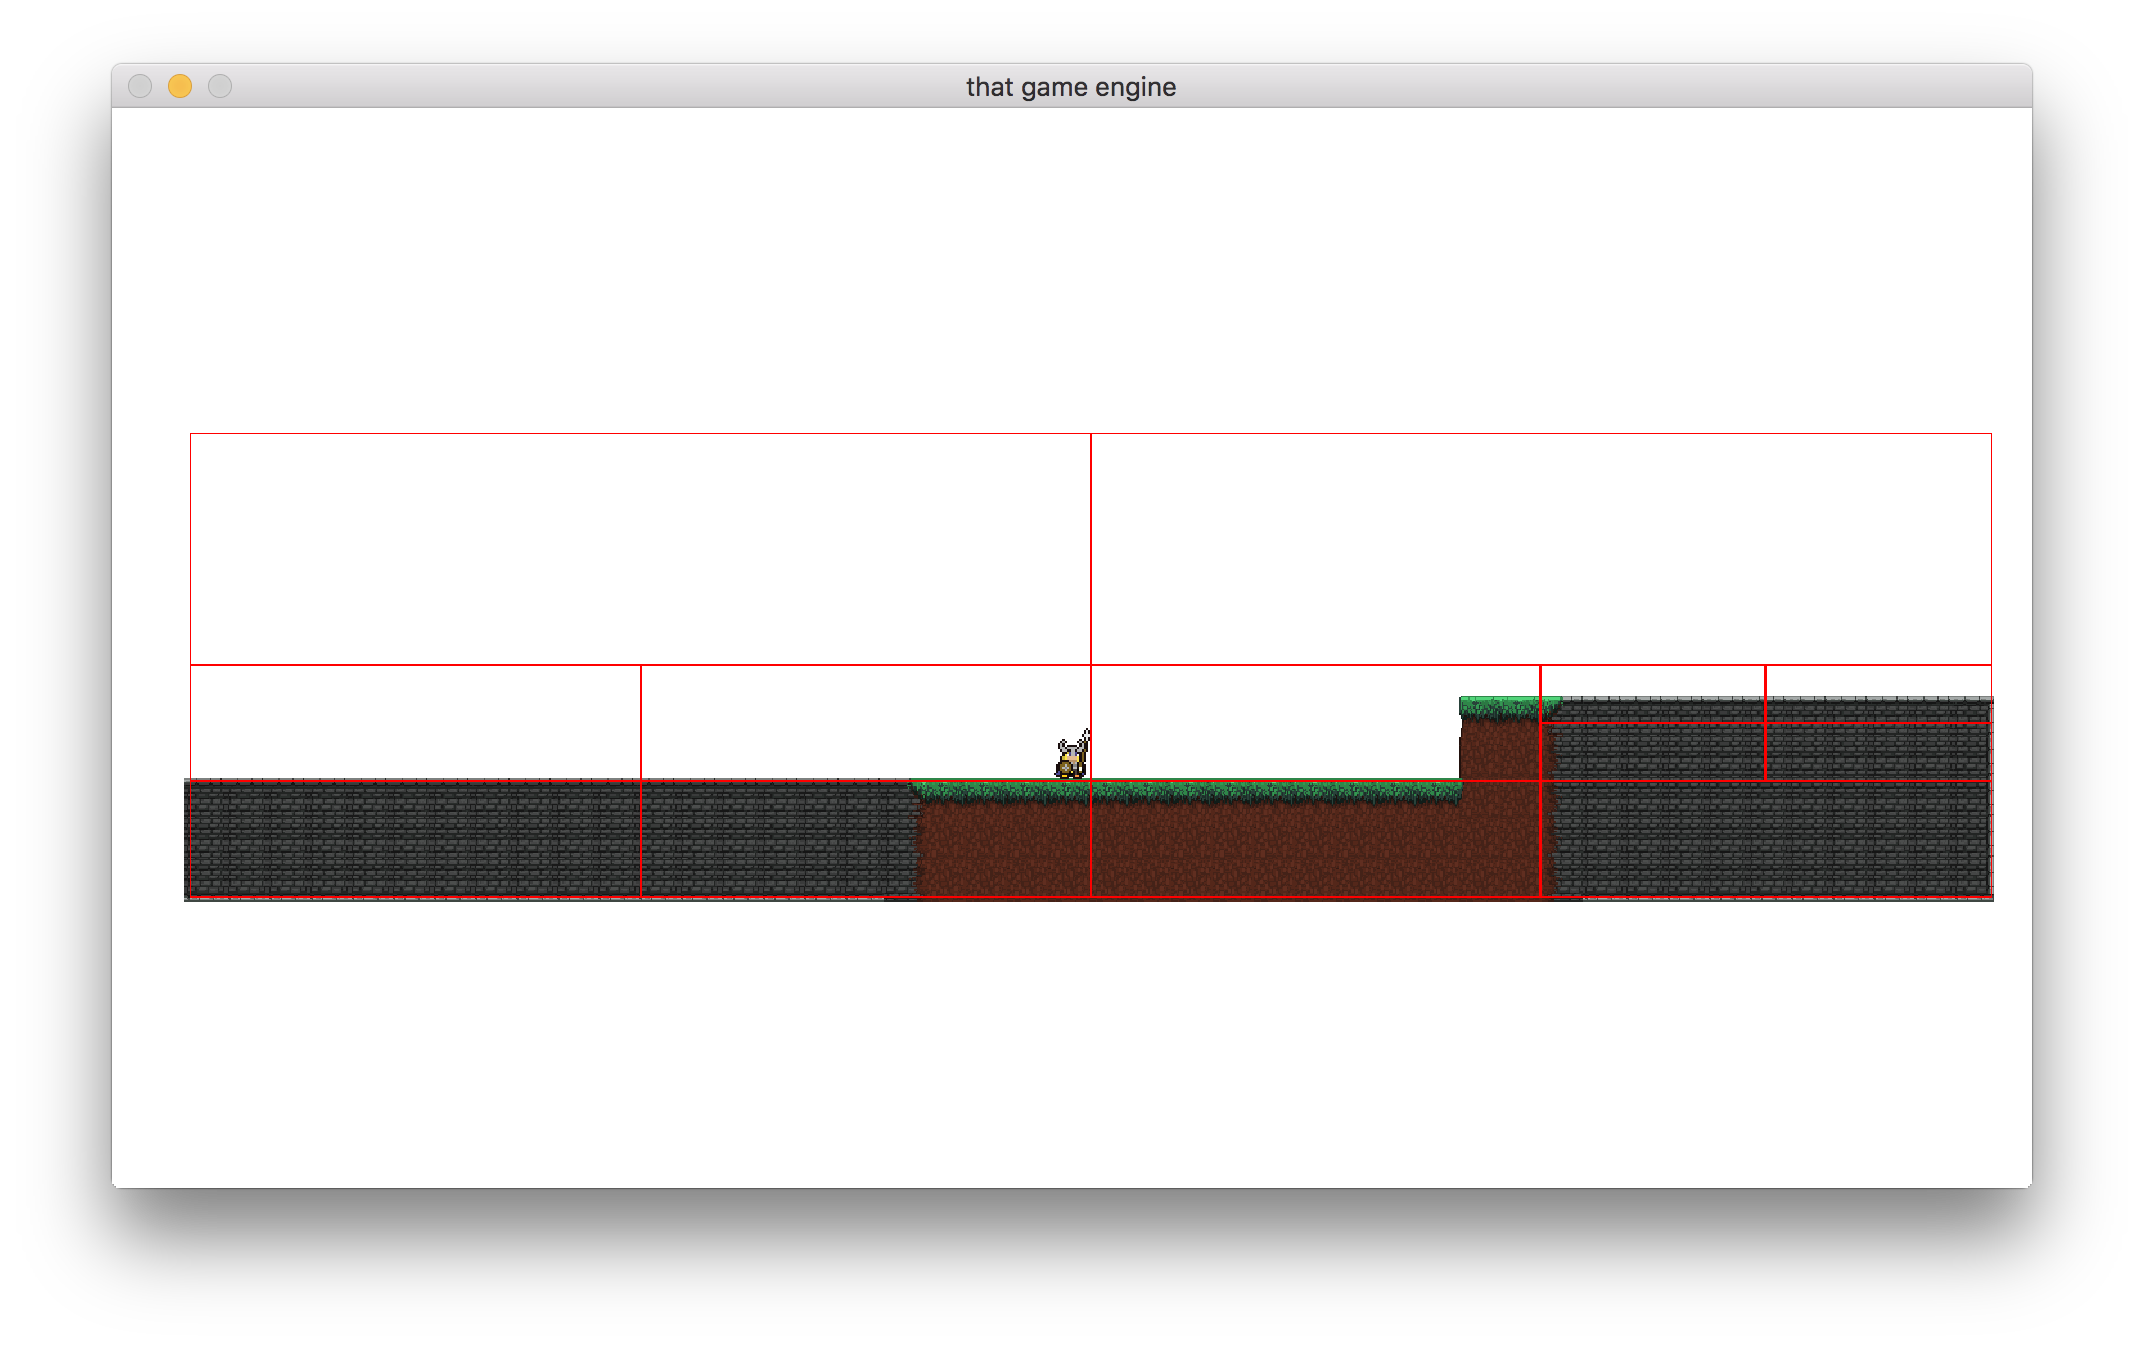 The quadtree bounds now encompass the whole level.